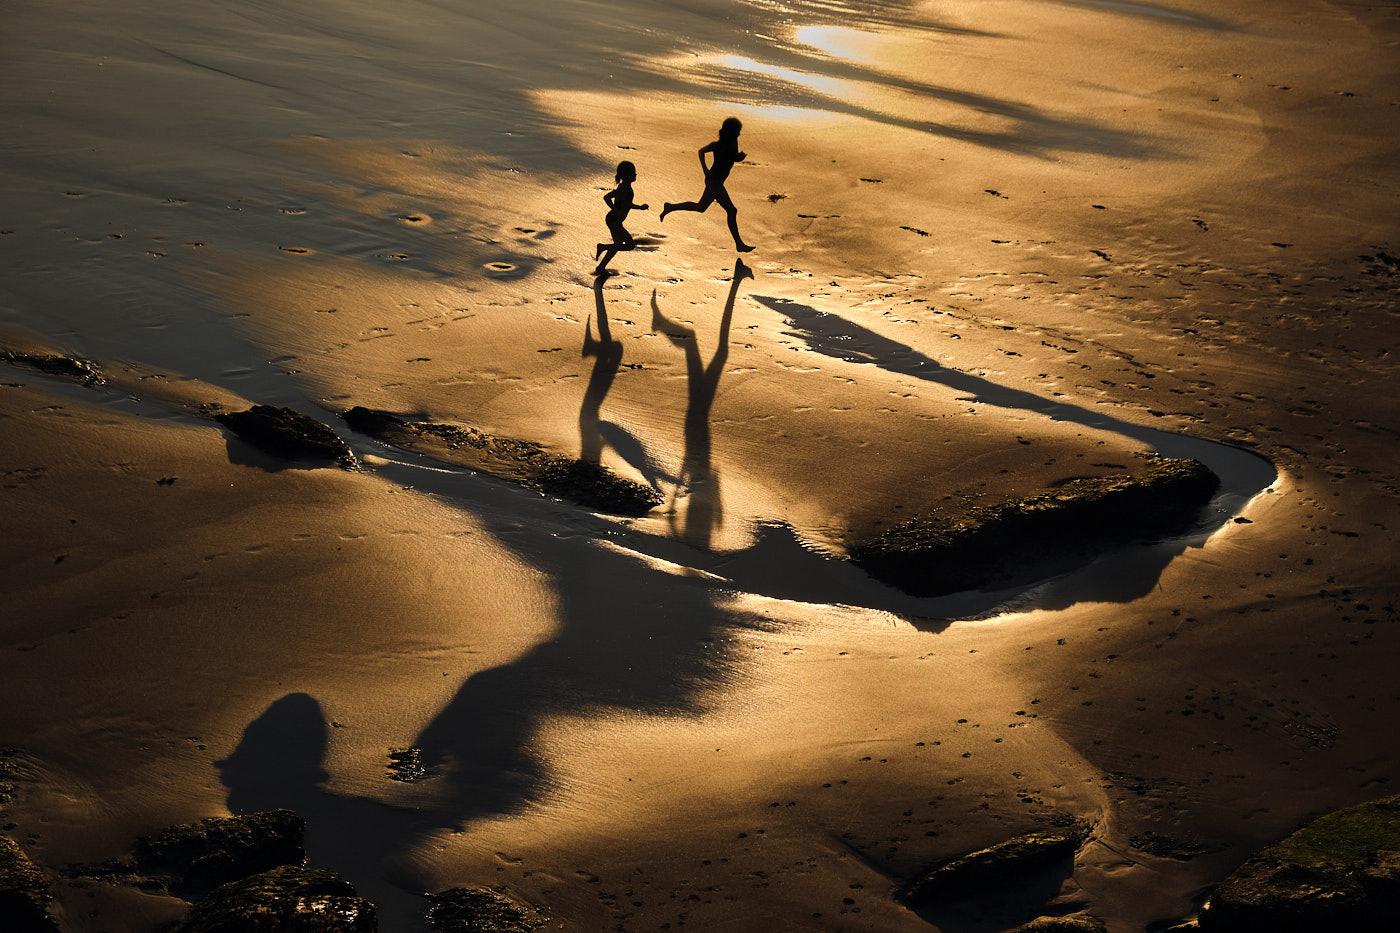 Marco Schweier: Am Strand